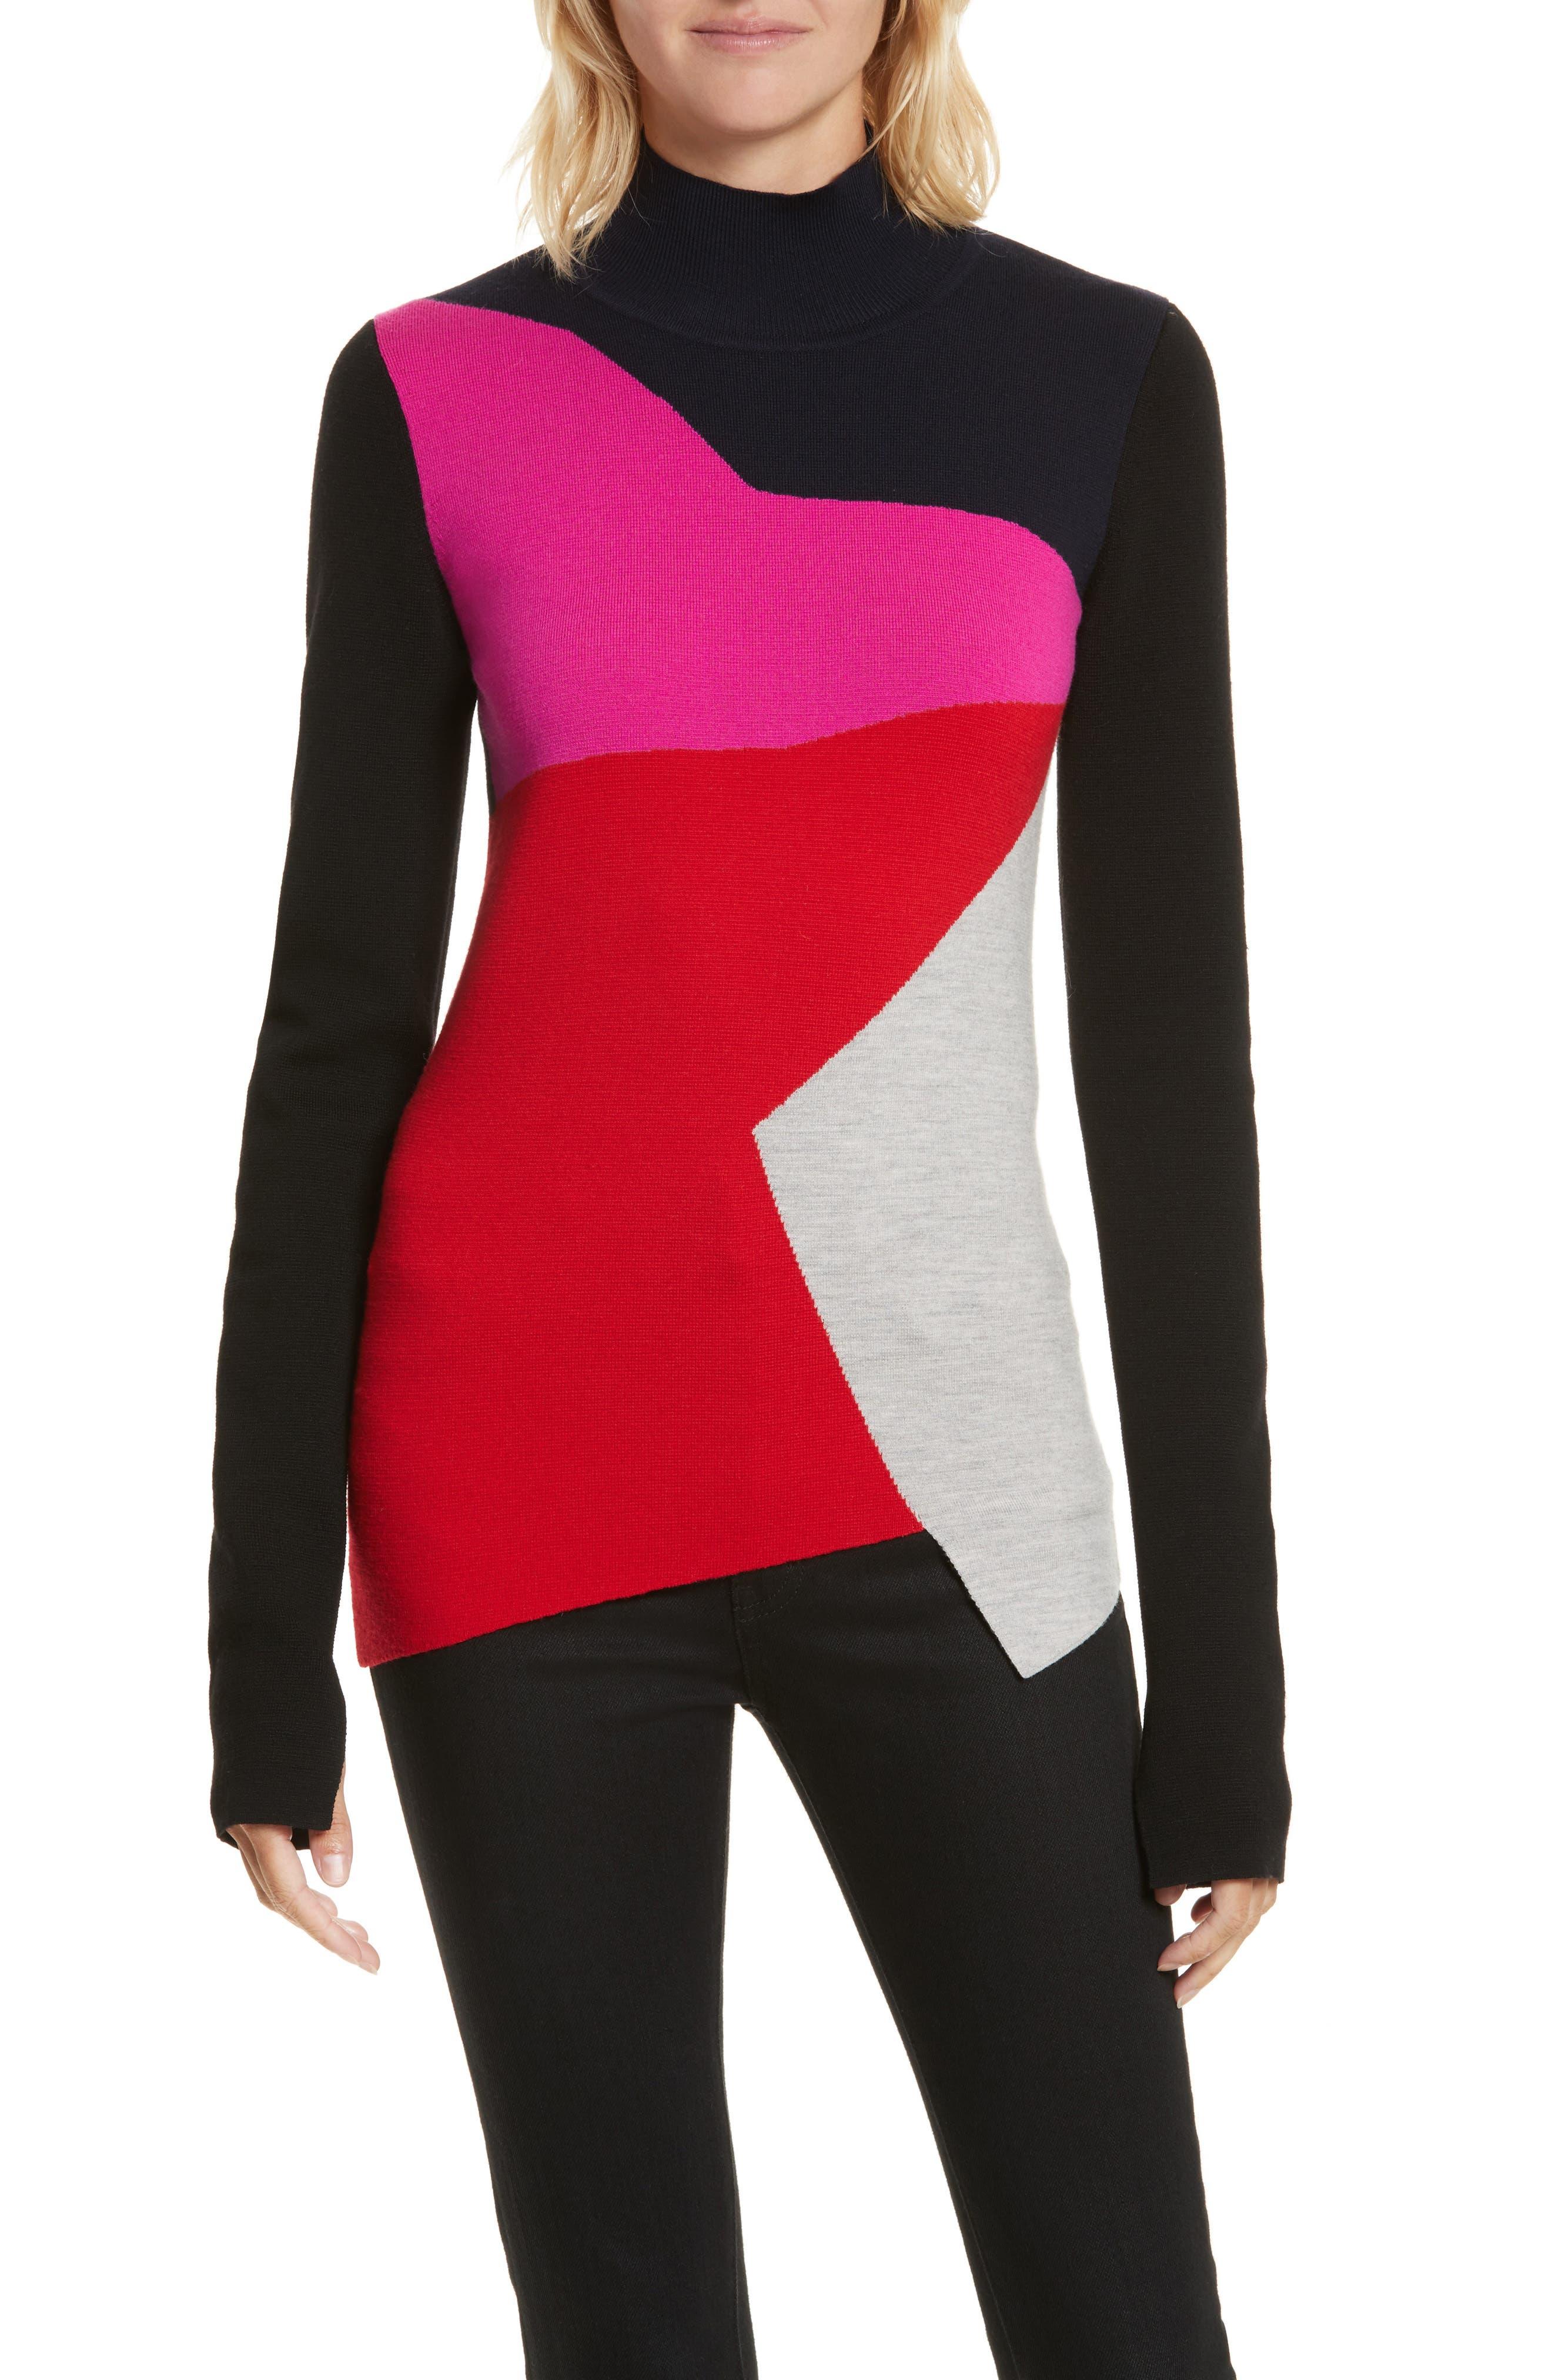 Diane von Furstenberg Colorblock Turtleneck Pullover,                         Main,                         color, 642